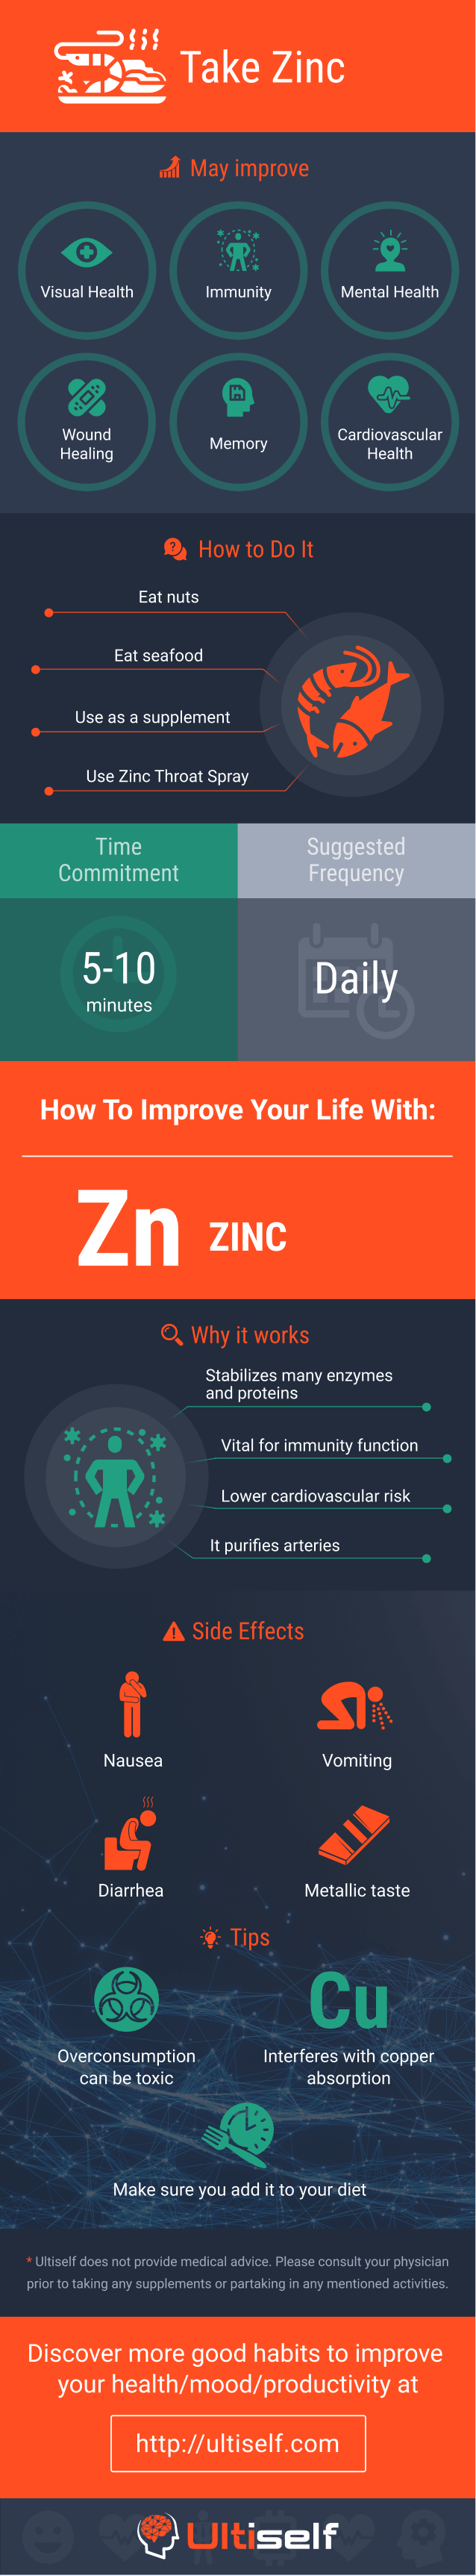 Take Zinc infographic